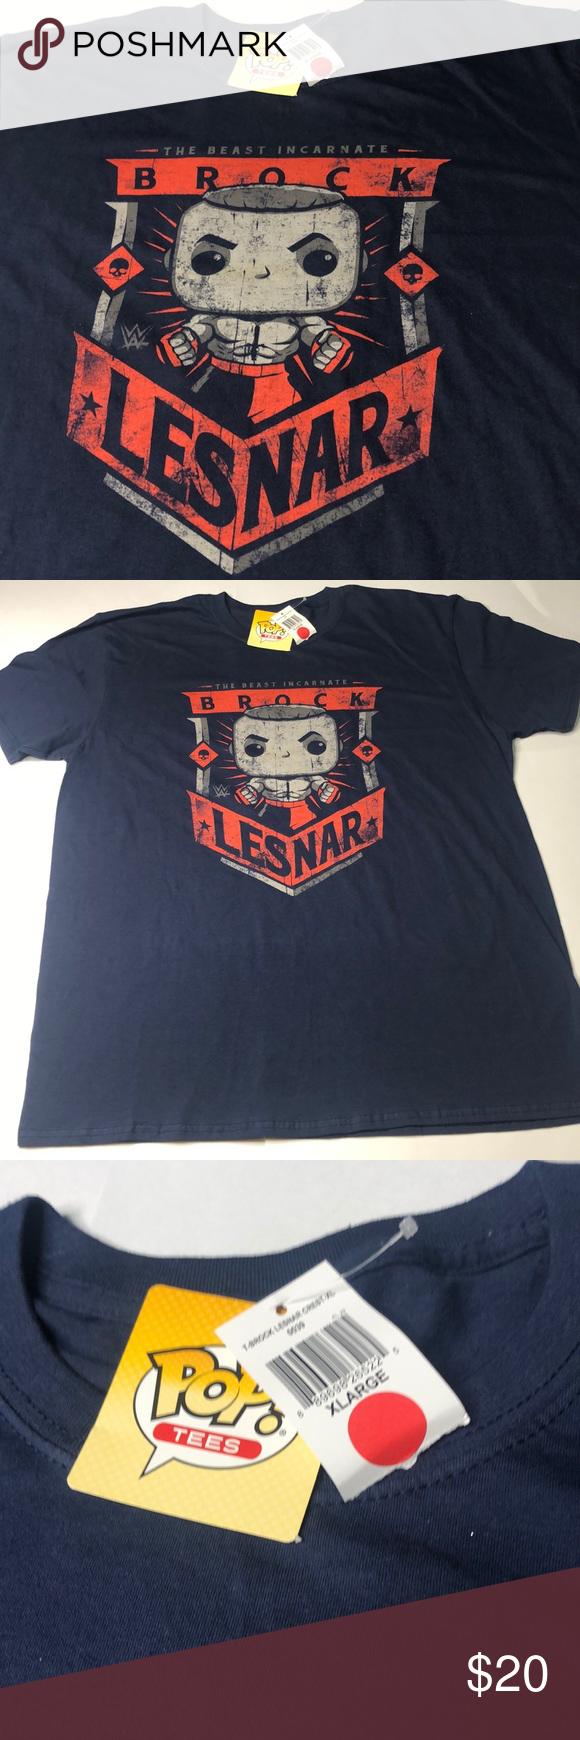 Nwt Brock Lesnar Pop T Shirt Wwe Mma Wwf Aew Ufc Clothes Design Pop T Fashion